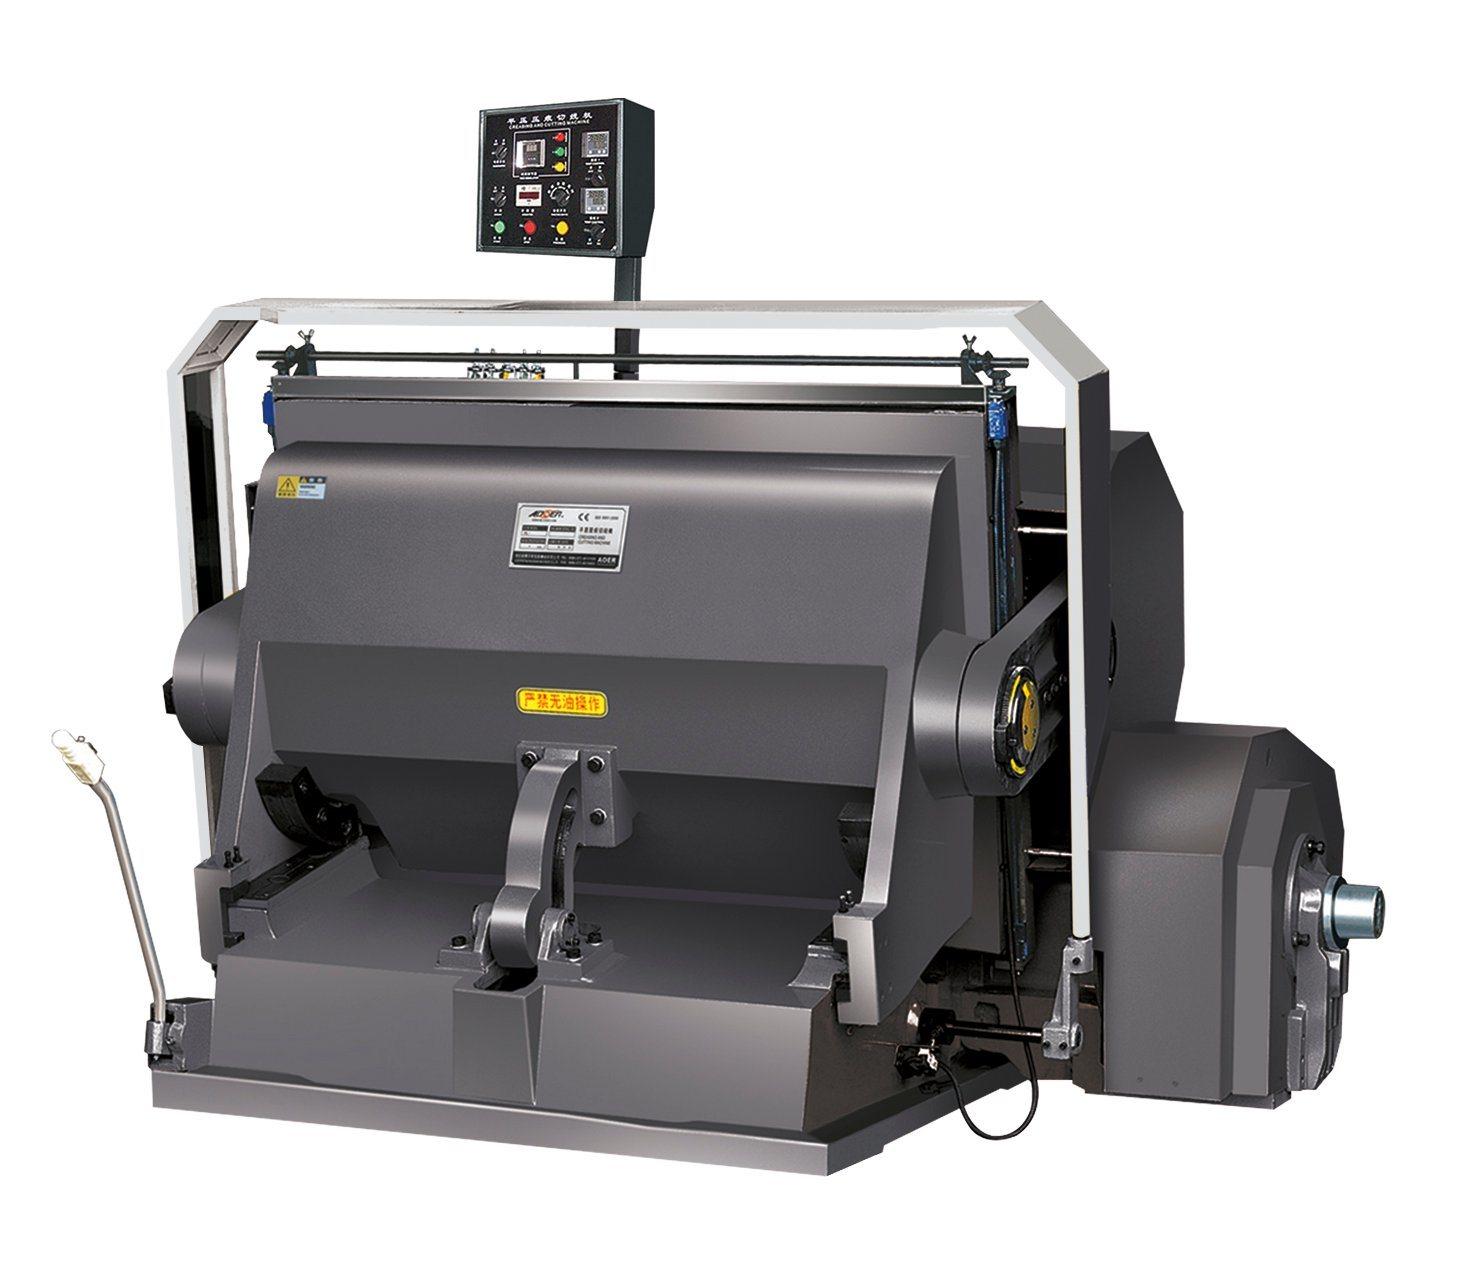 Ml-1500 Creasing and Die Cutting Machine